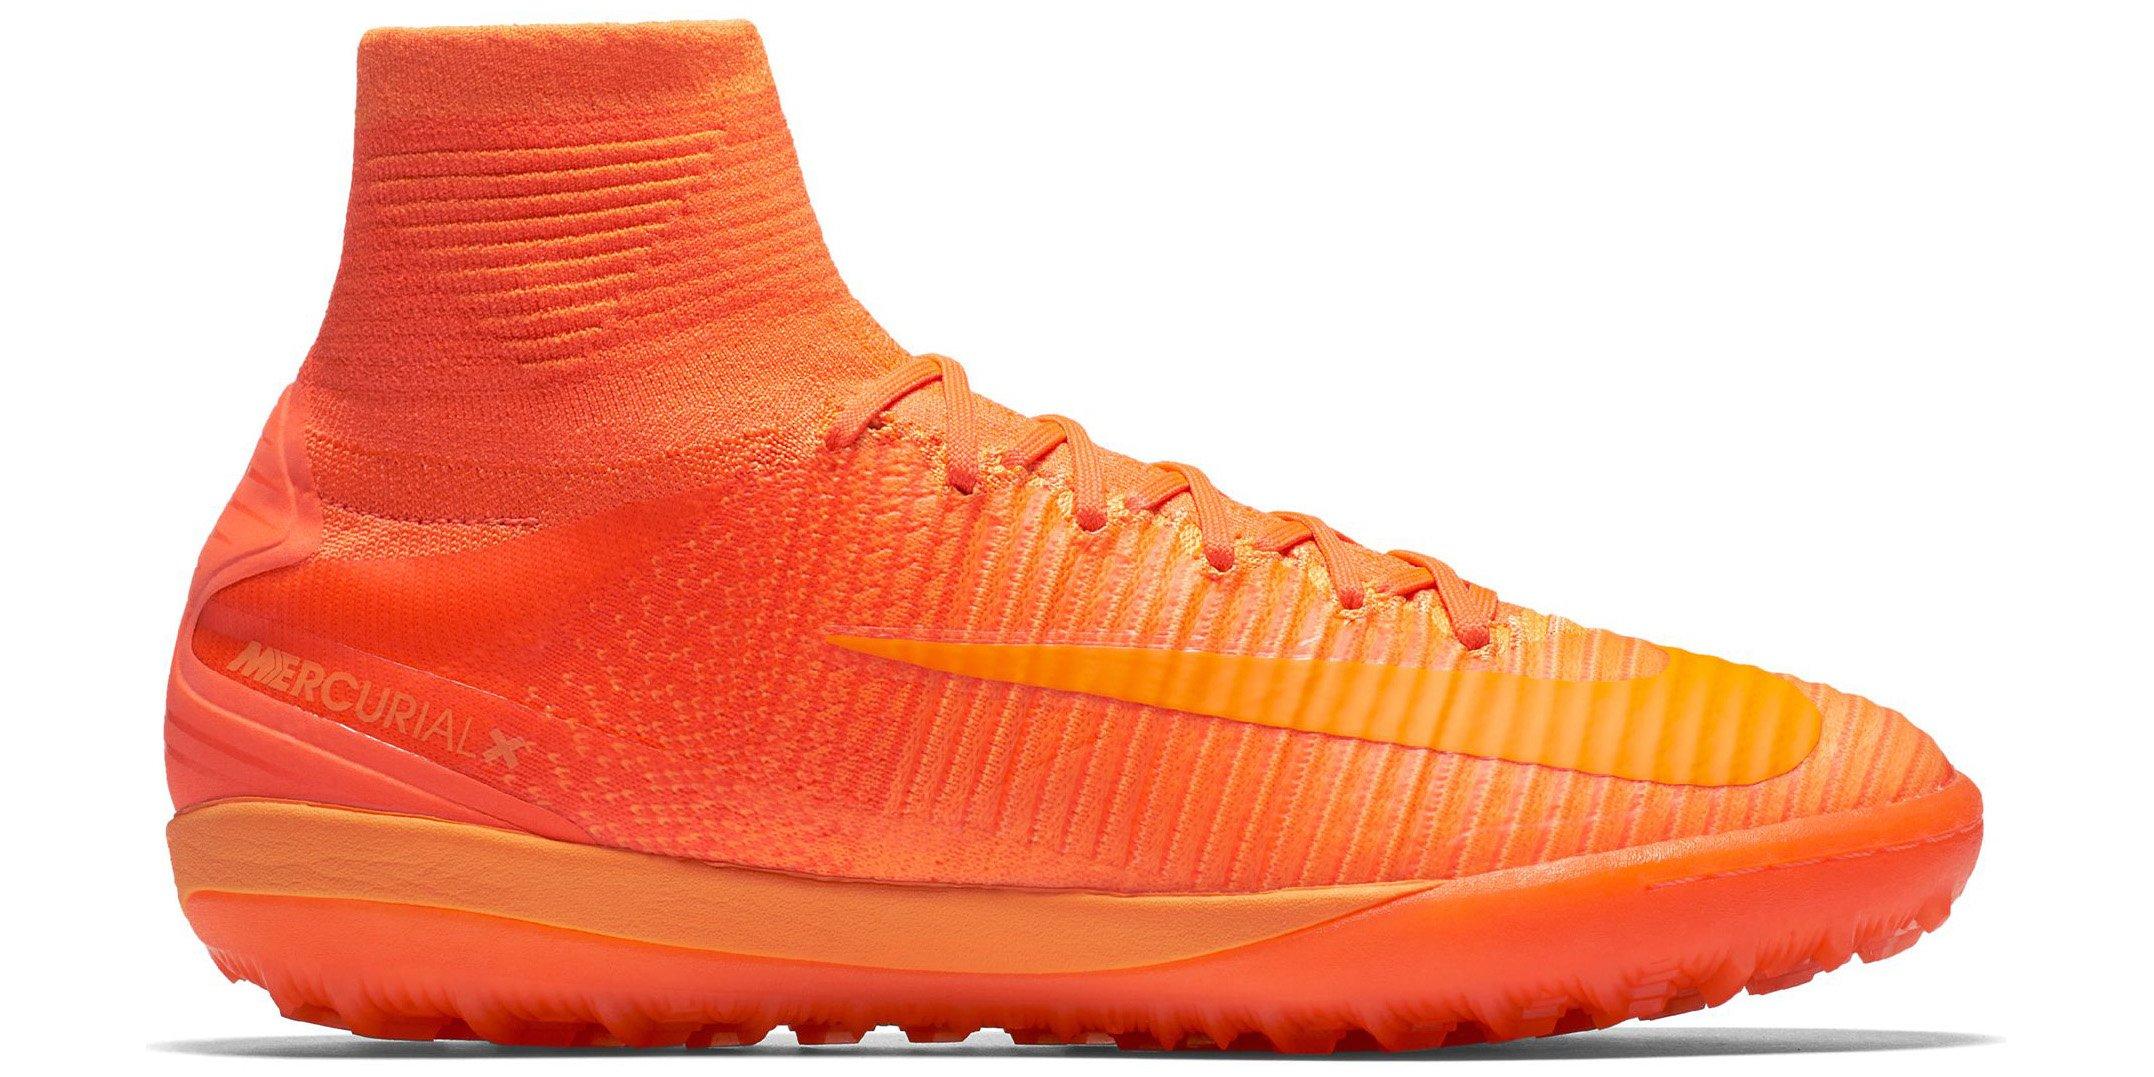 Kopačky Nike MercurialX Proximo II TF